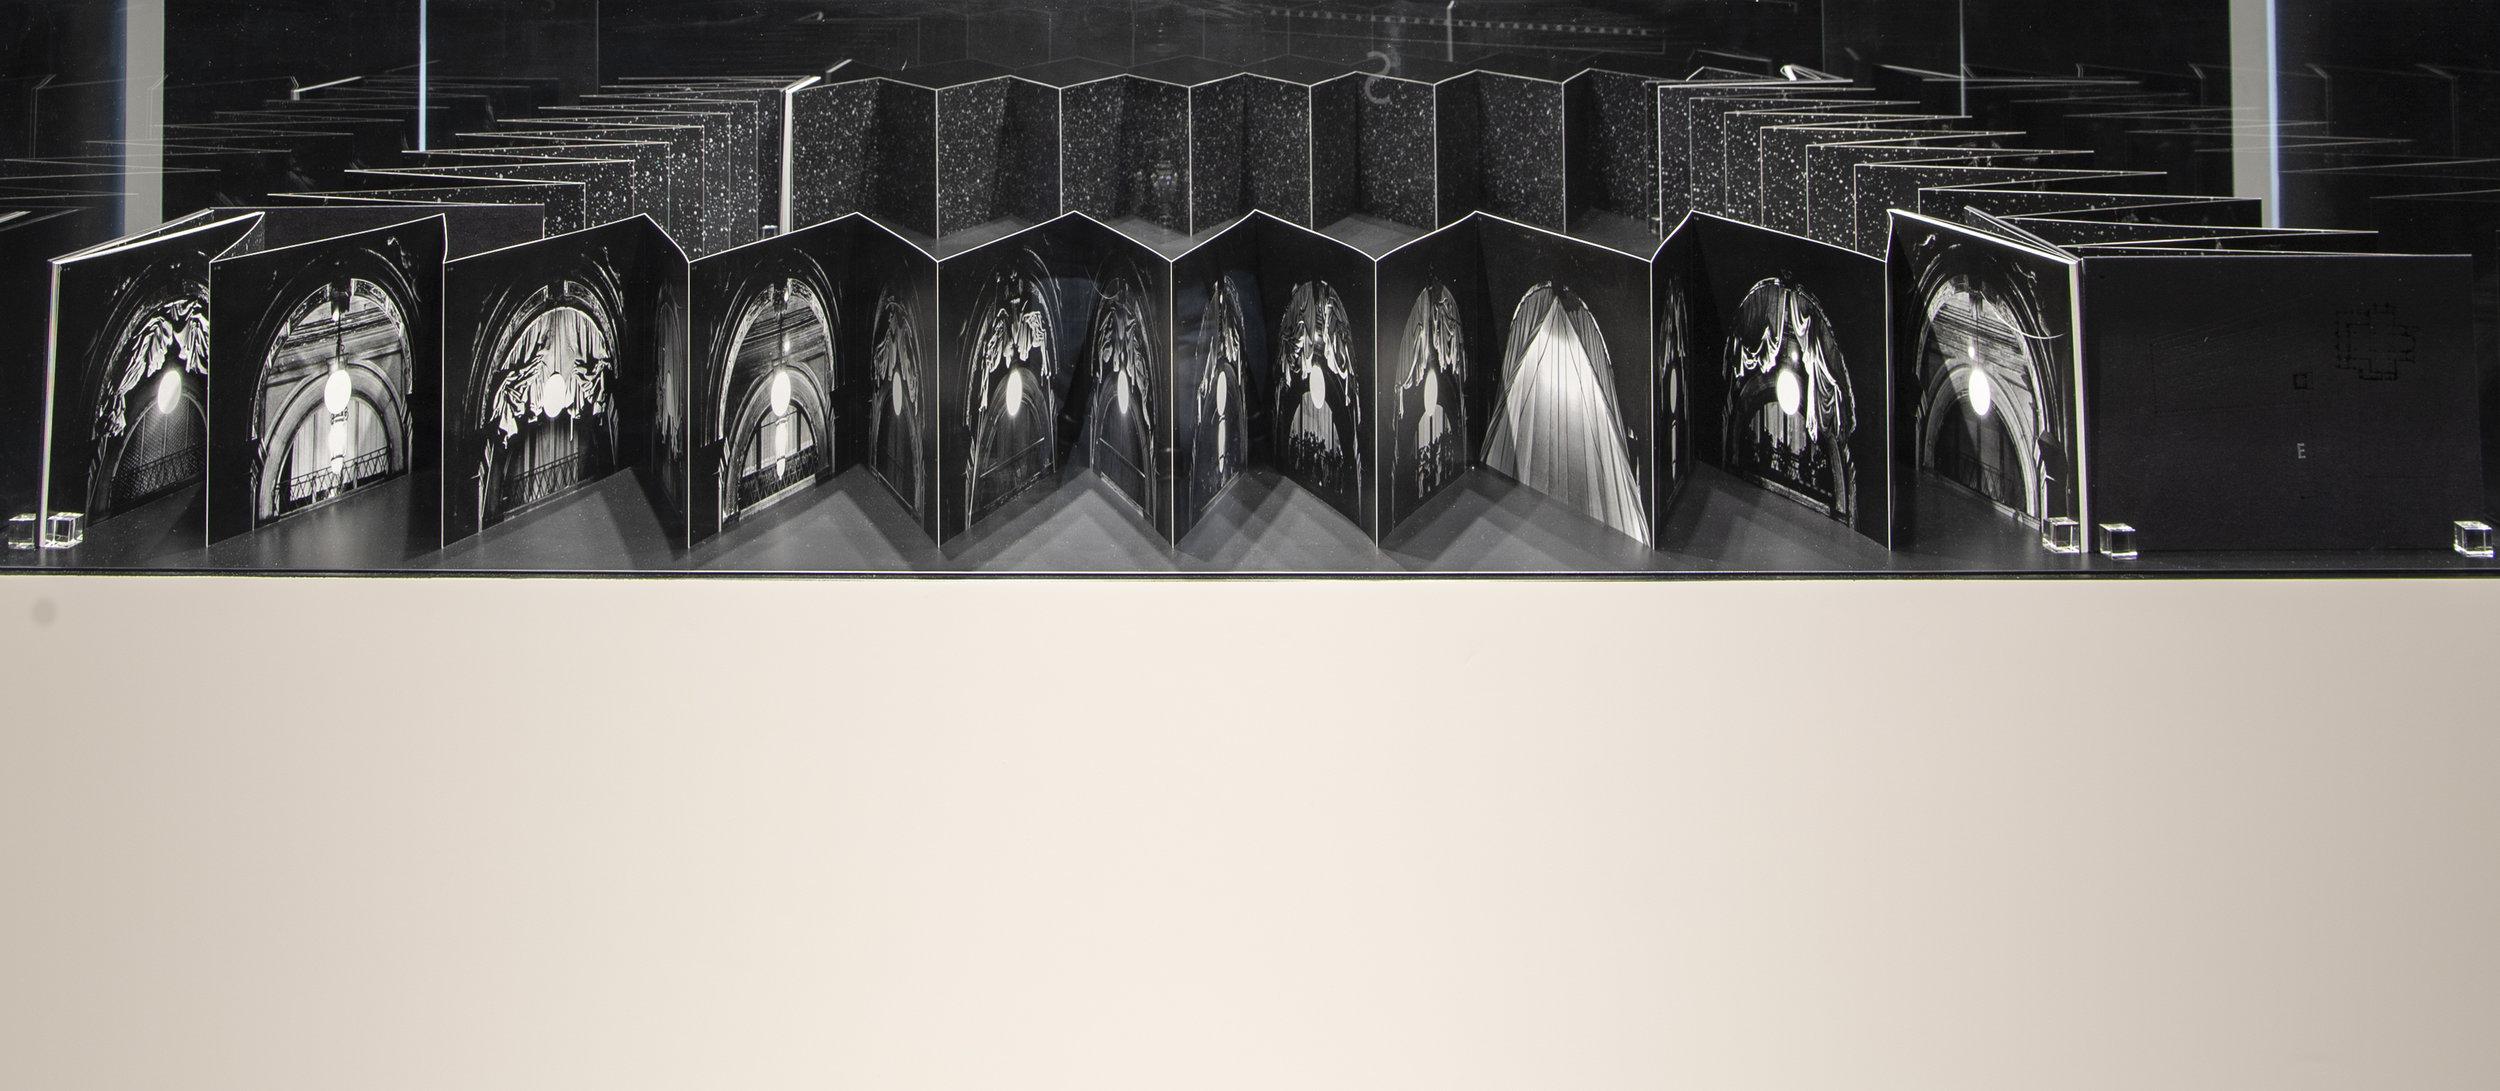 Ikko Narahara, Arcades of Light–Piazza San Marco, 1981. Book, 22 x 31.5 x 9.5cm. Installation view, Al Hamriyah Studios, Sharjah Art Foundation, 2018. Image courtesy of Sharjah Art Foundation